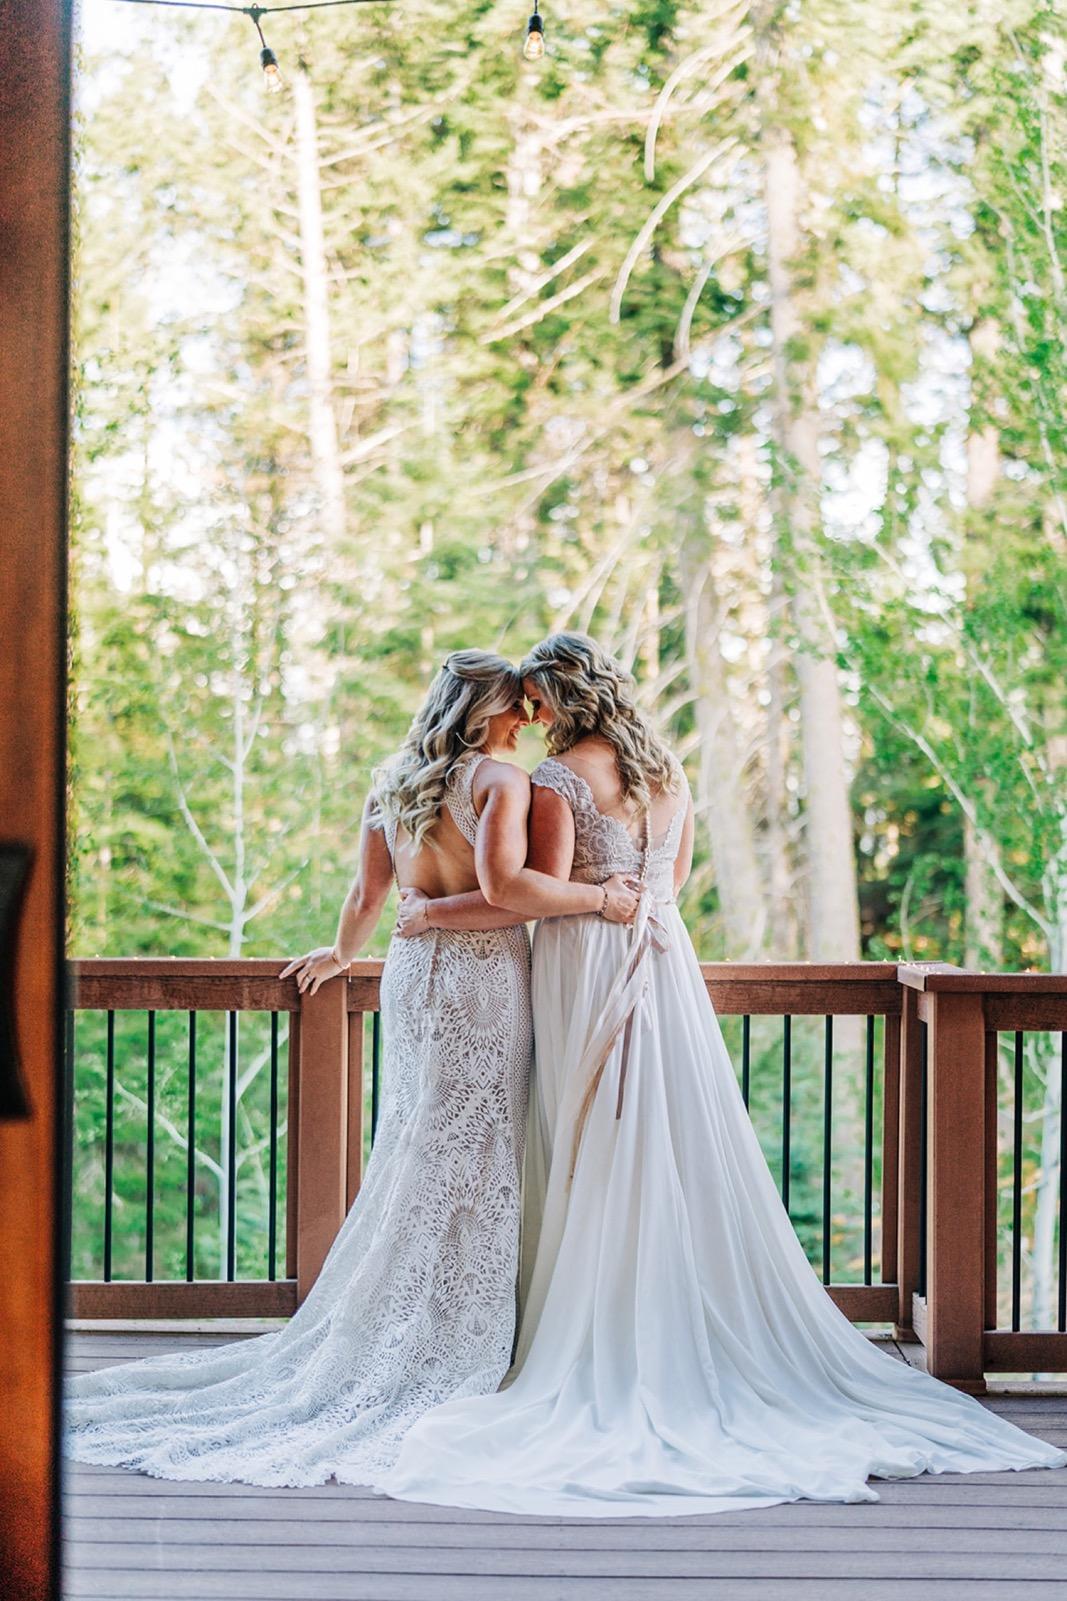 152_falissa_heather_wedding-464.jpg